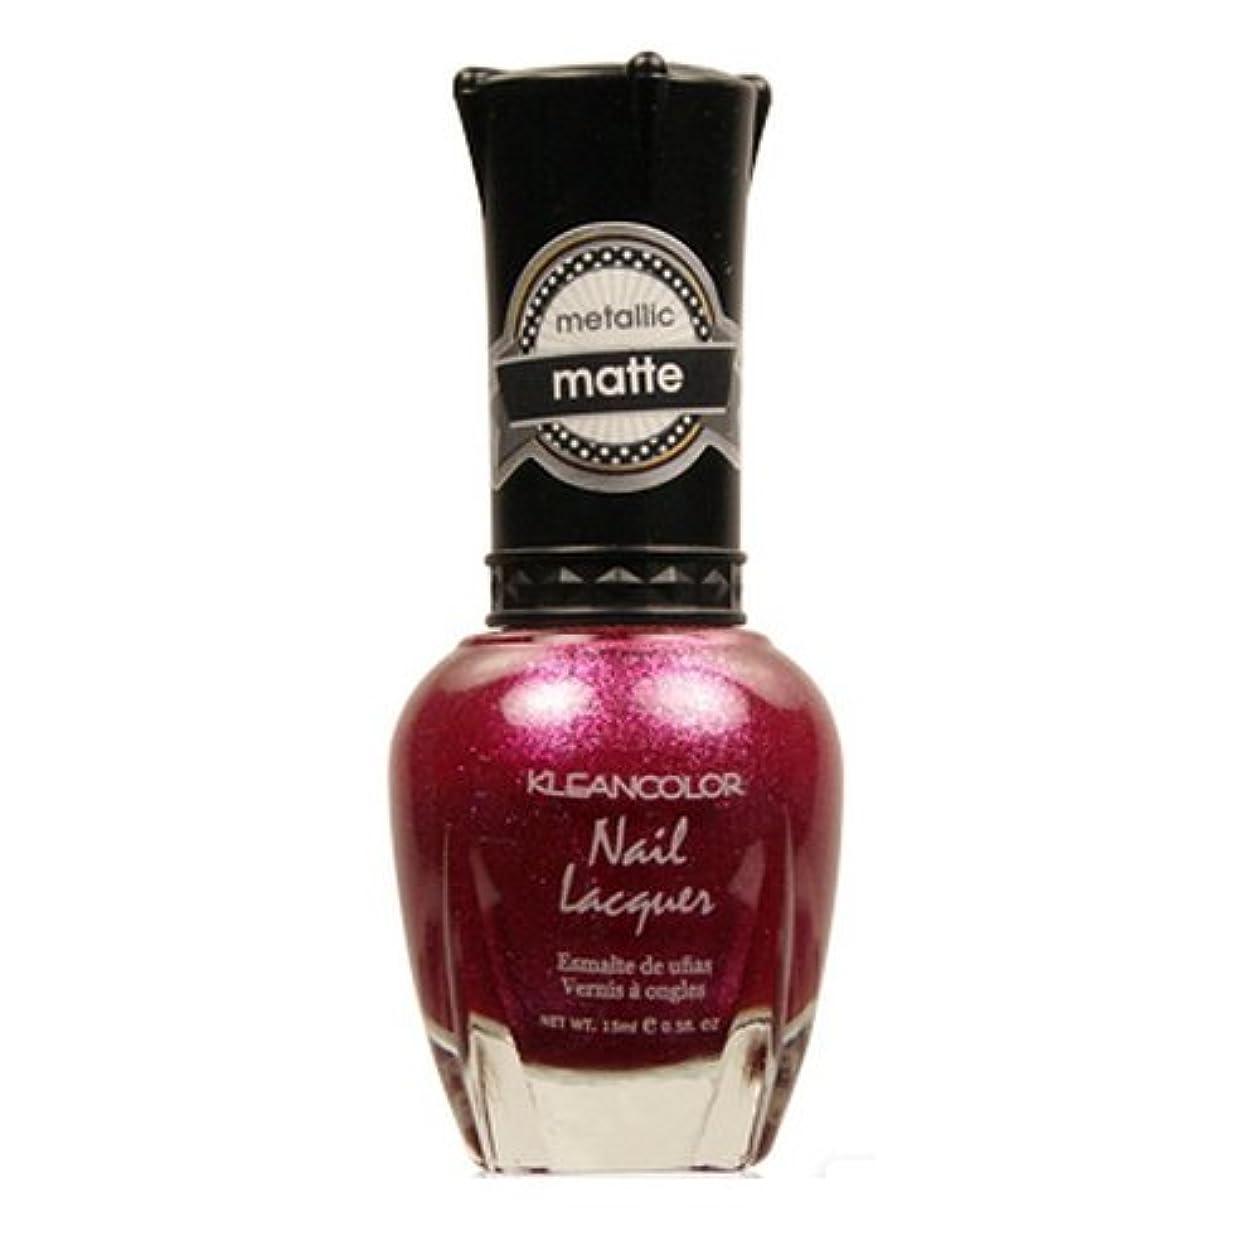 KLEANCOLOR Matte Nail Lacquer - Cast a Love Spell (並行輸入品)